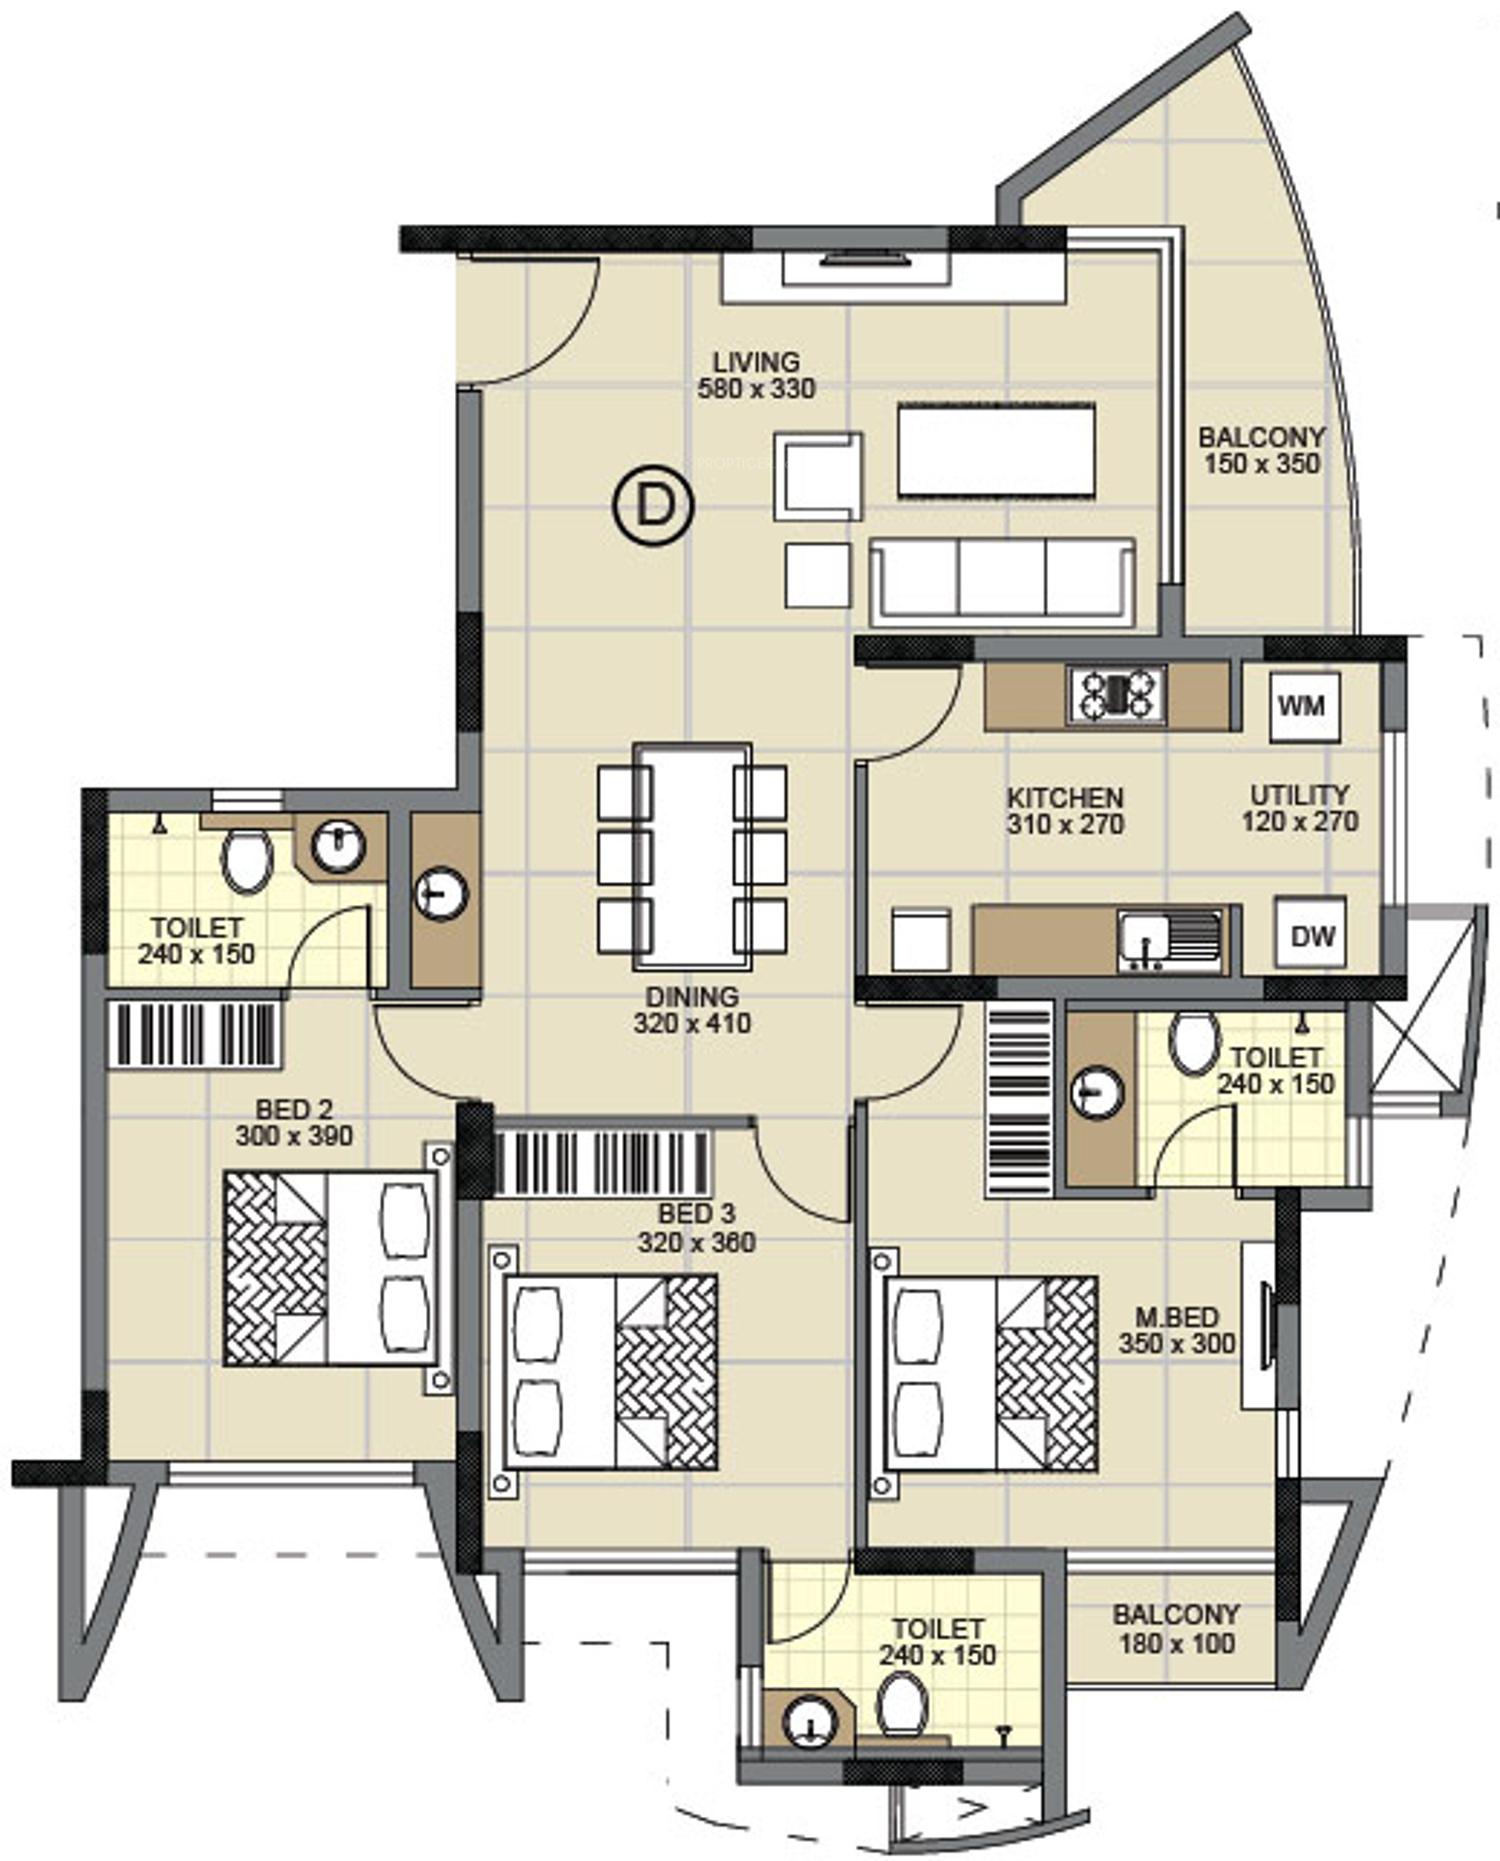 Skyline builders home plans